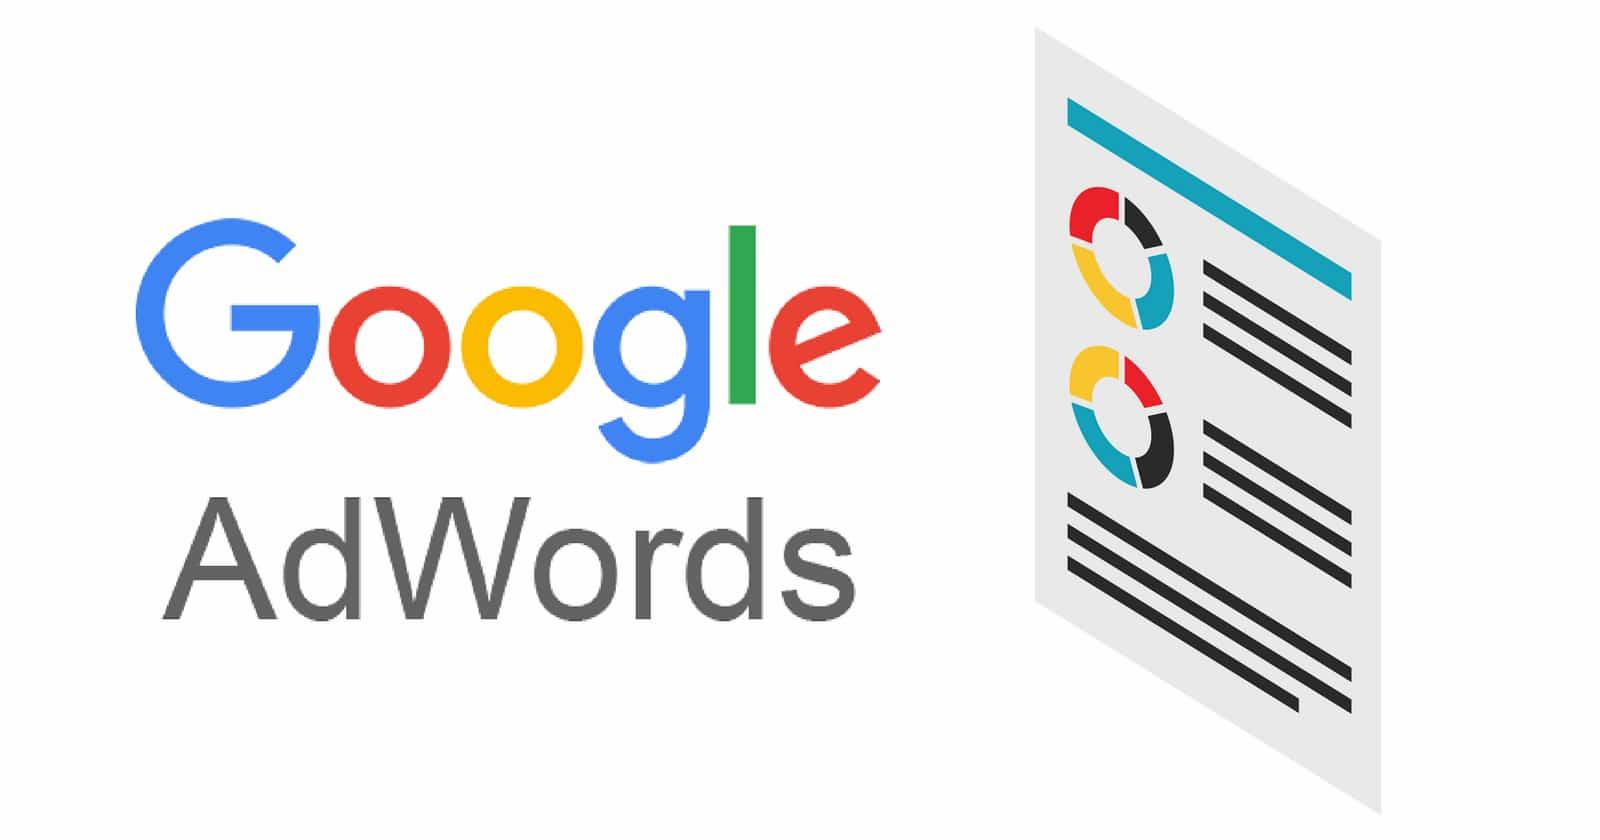 Aprenda a usar as plataformas do Google <p><span>a seu favor</span></p>